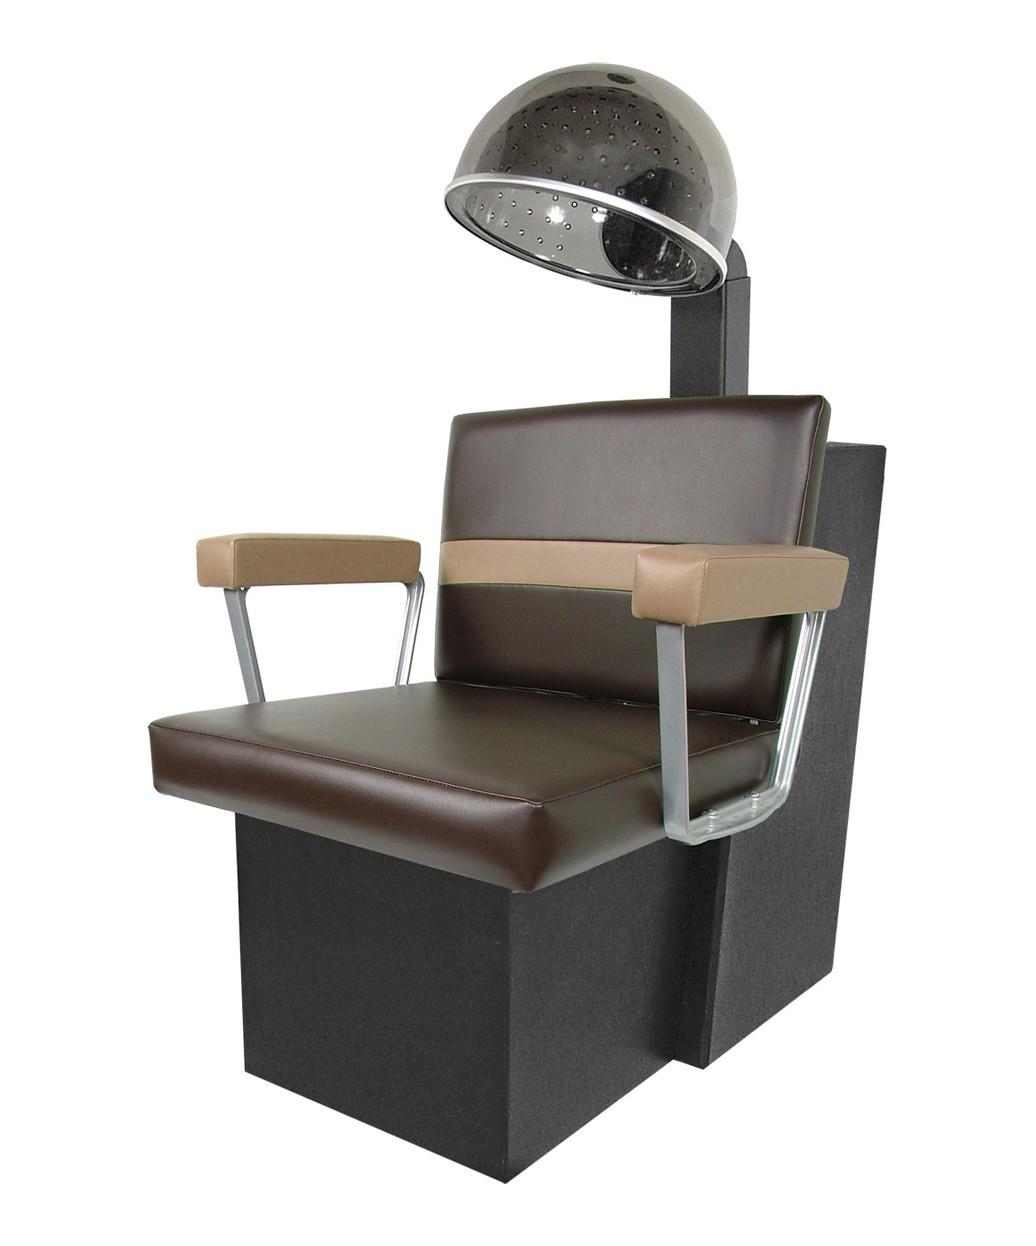 Collins - Taress Dryer Chair